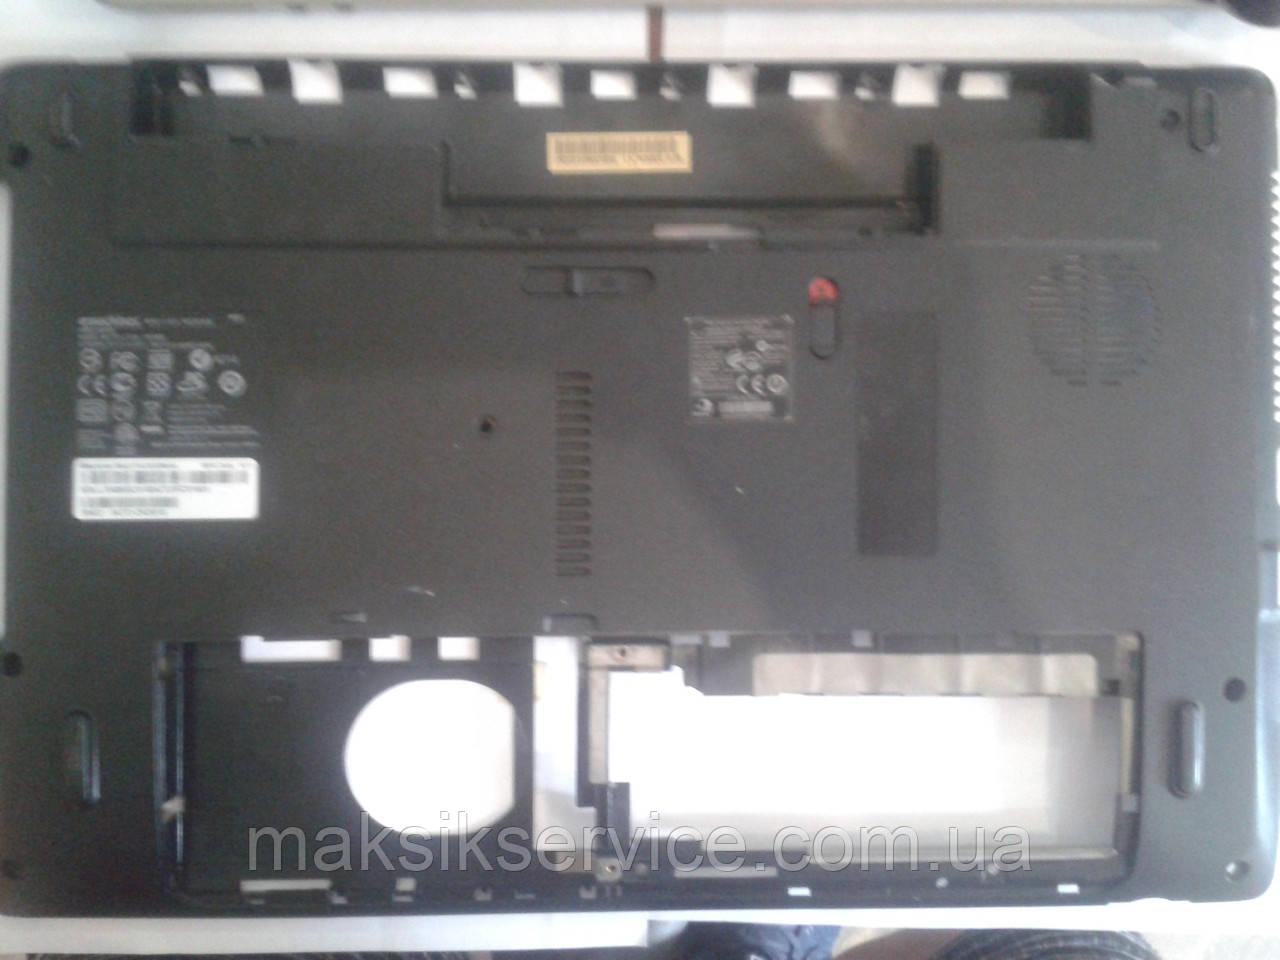 Поддон нижняя крышка на ноутбук acer emachines e642